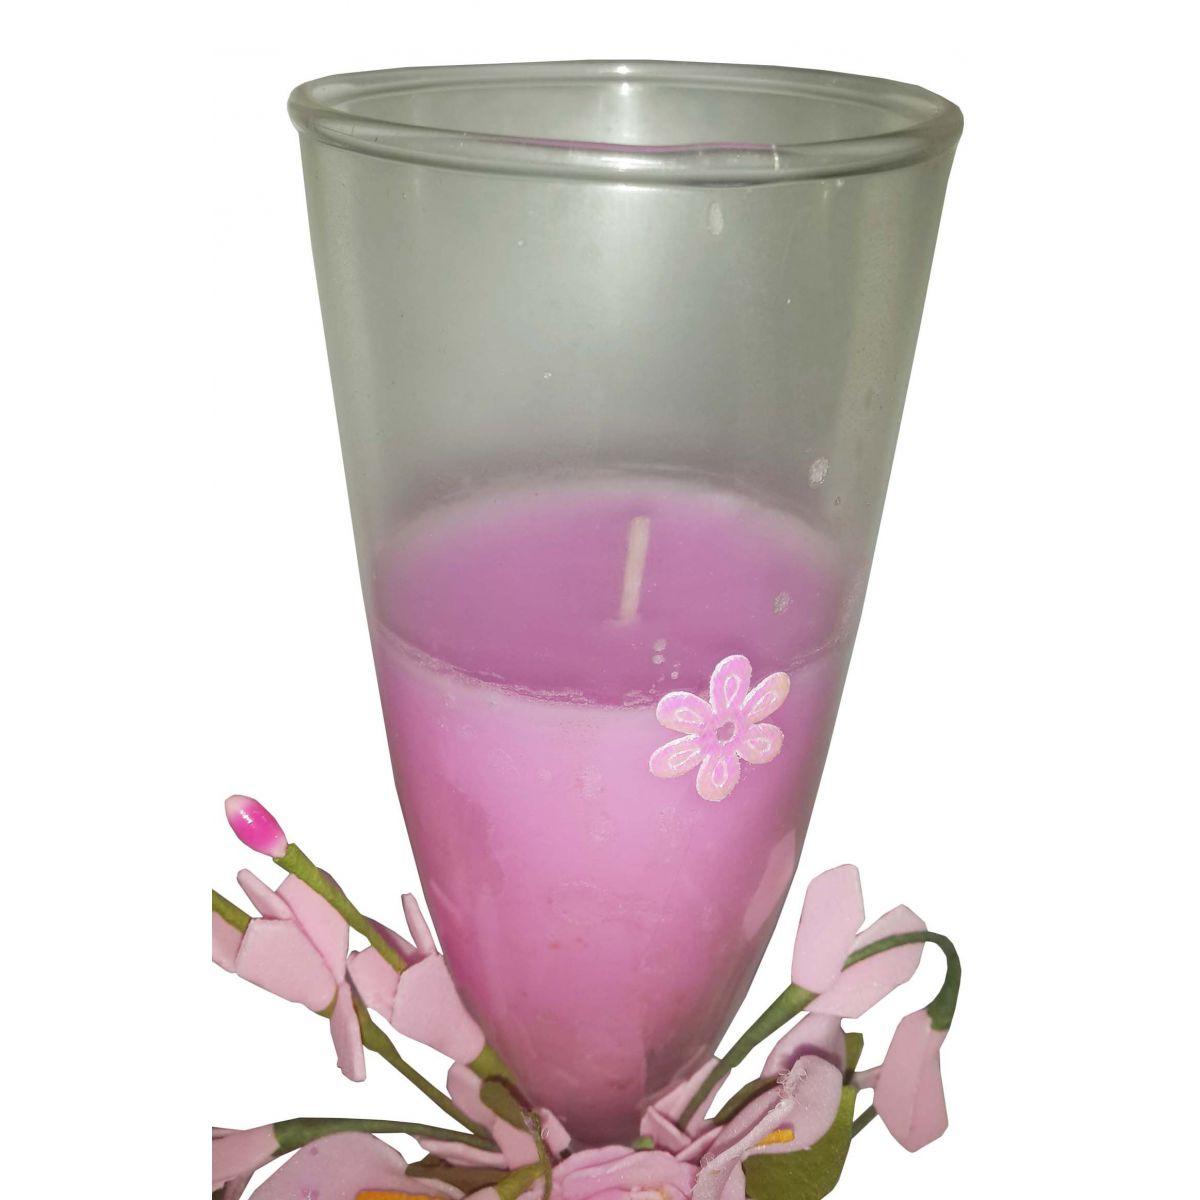 Vela Parafina Perfumada Decorativa Grande Fragrancia Flores Rosa (WL-A)